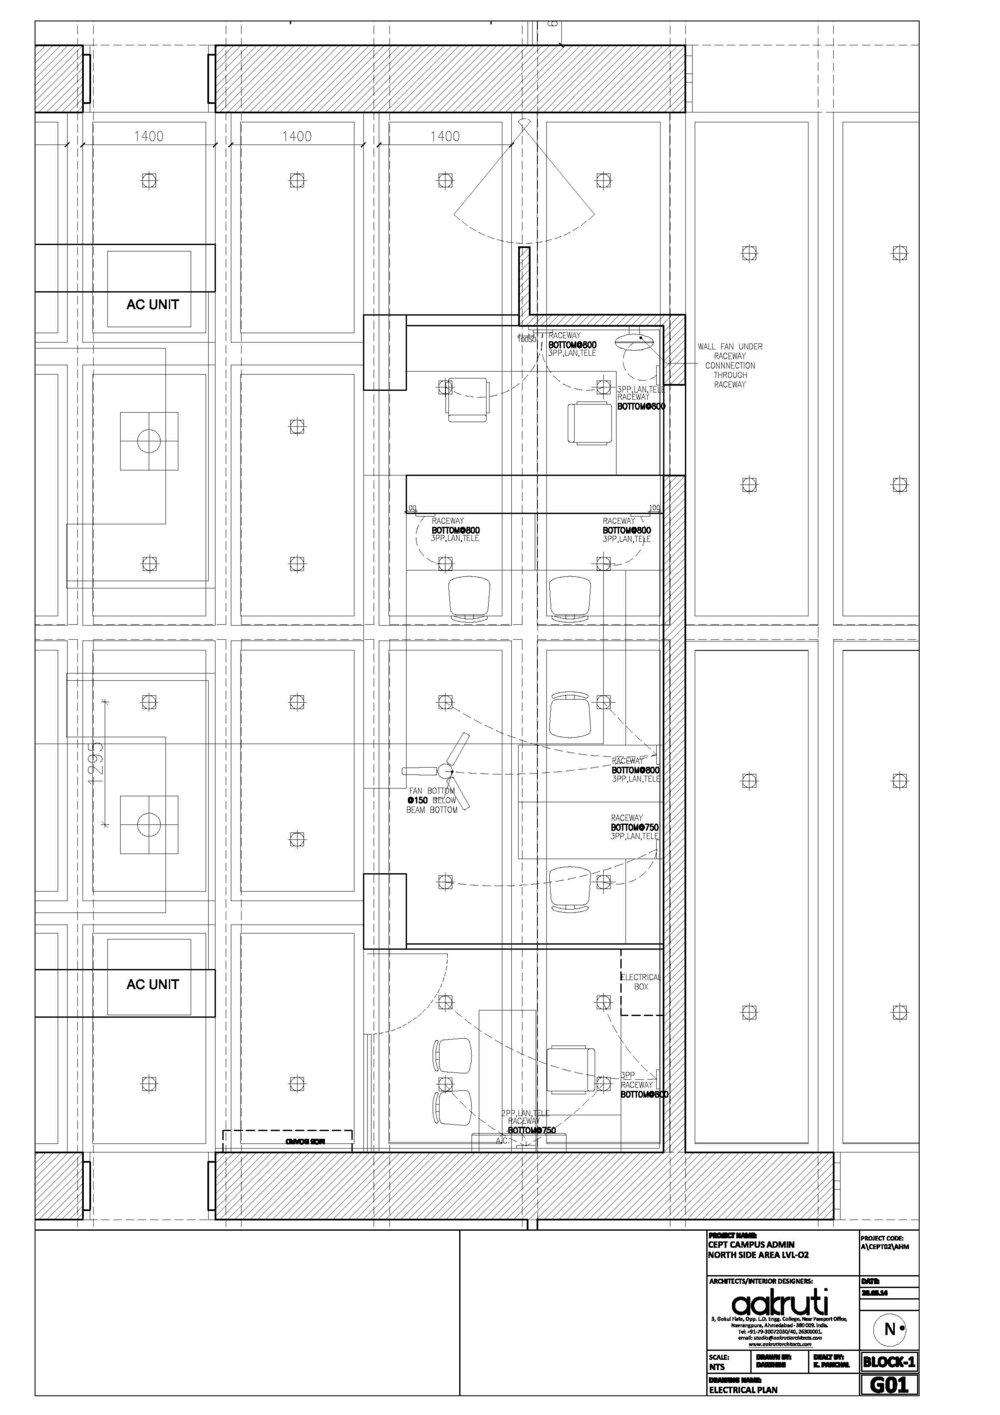 electrical-Layout2.jpg